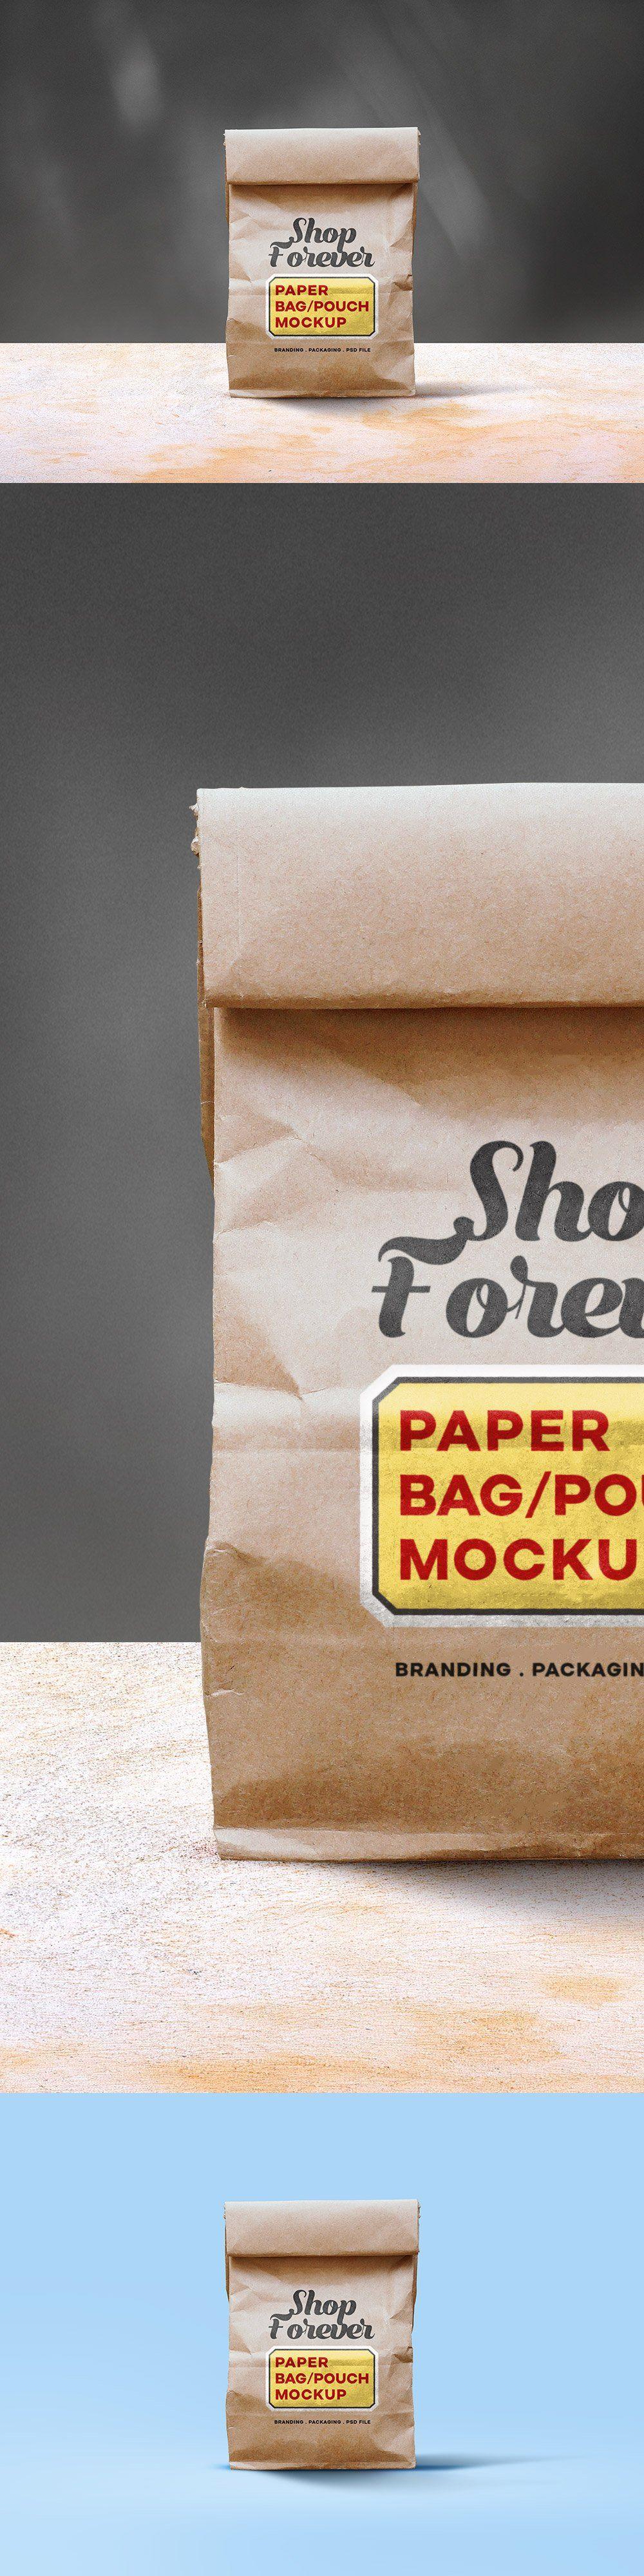 Download Free Front View Paper Bag Mockup Psd Creativebooster Bag Mockup Design Mockup Free Paper Bag